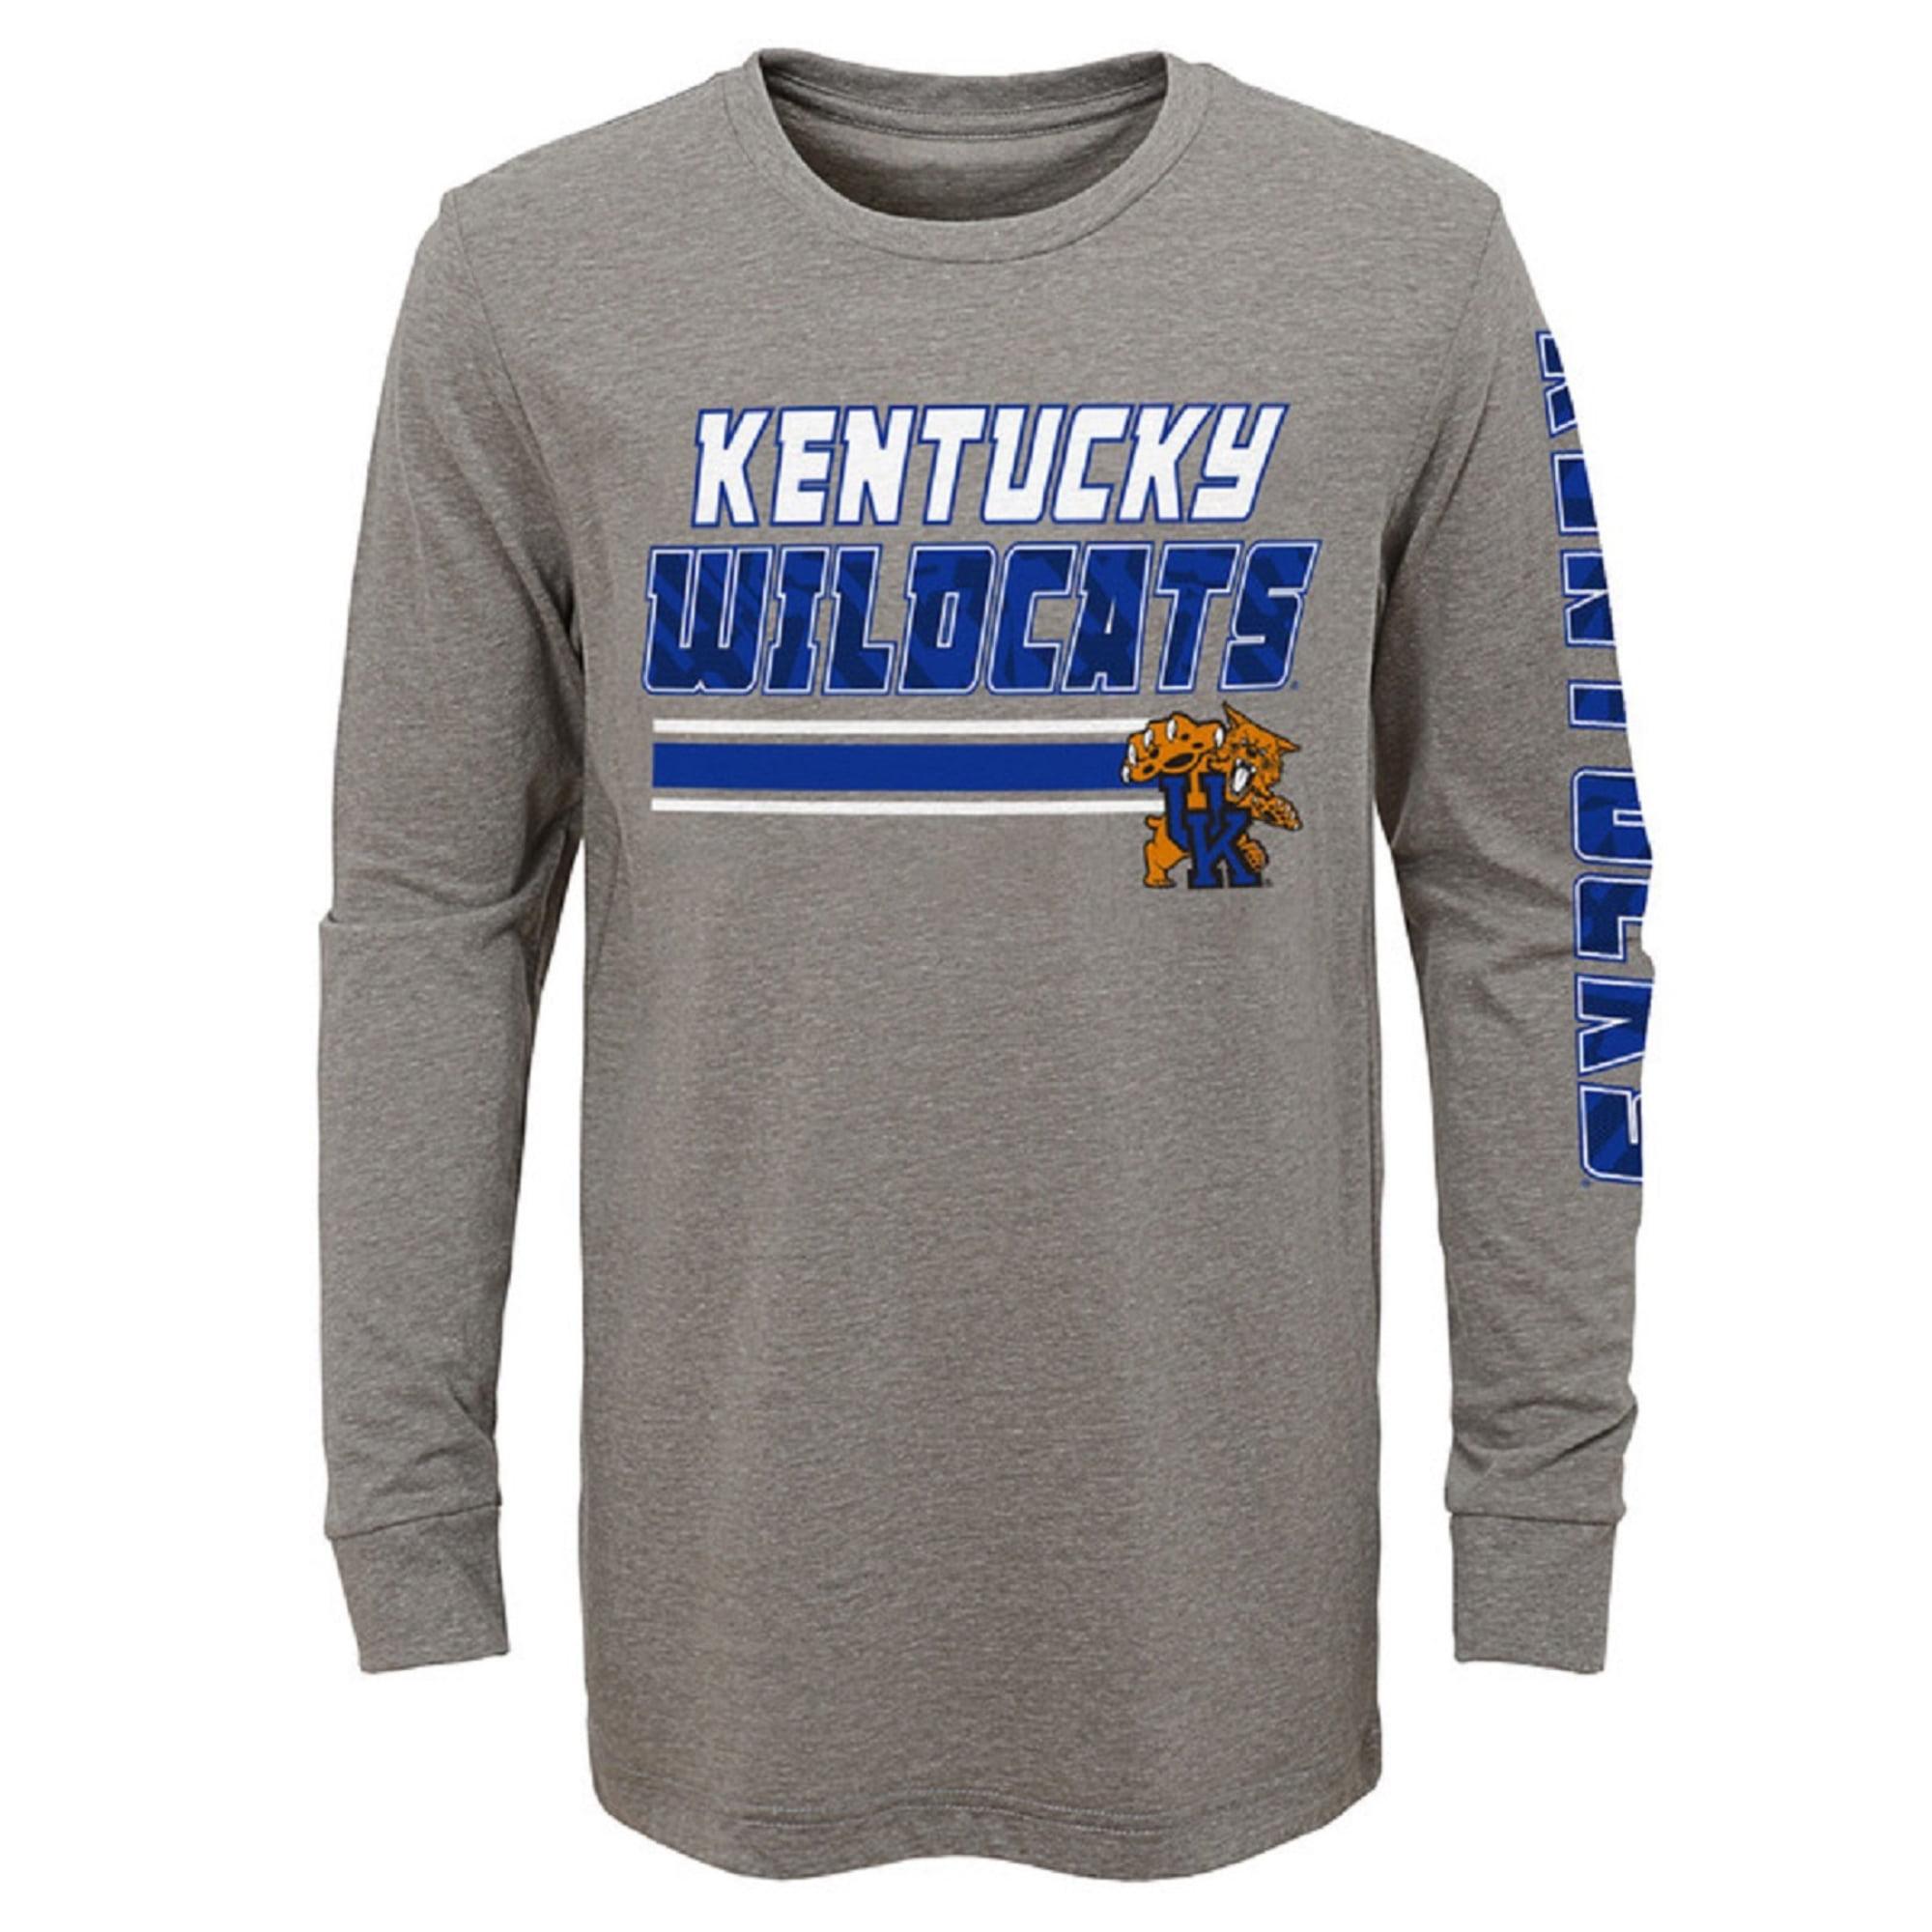 Youth Gray Kentucky Wildcats Cotton Polyester Long Sleeve T-Shirt -  Walmart.com aeeae2b270c6